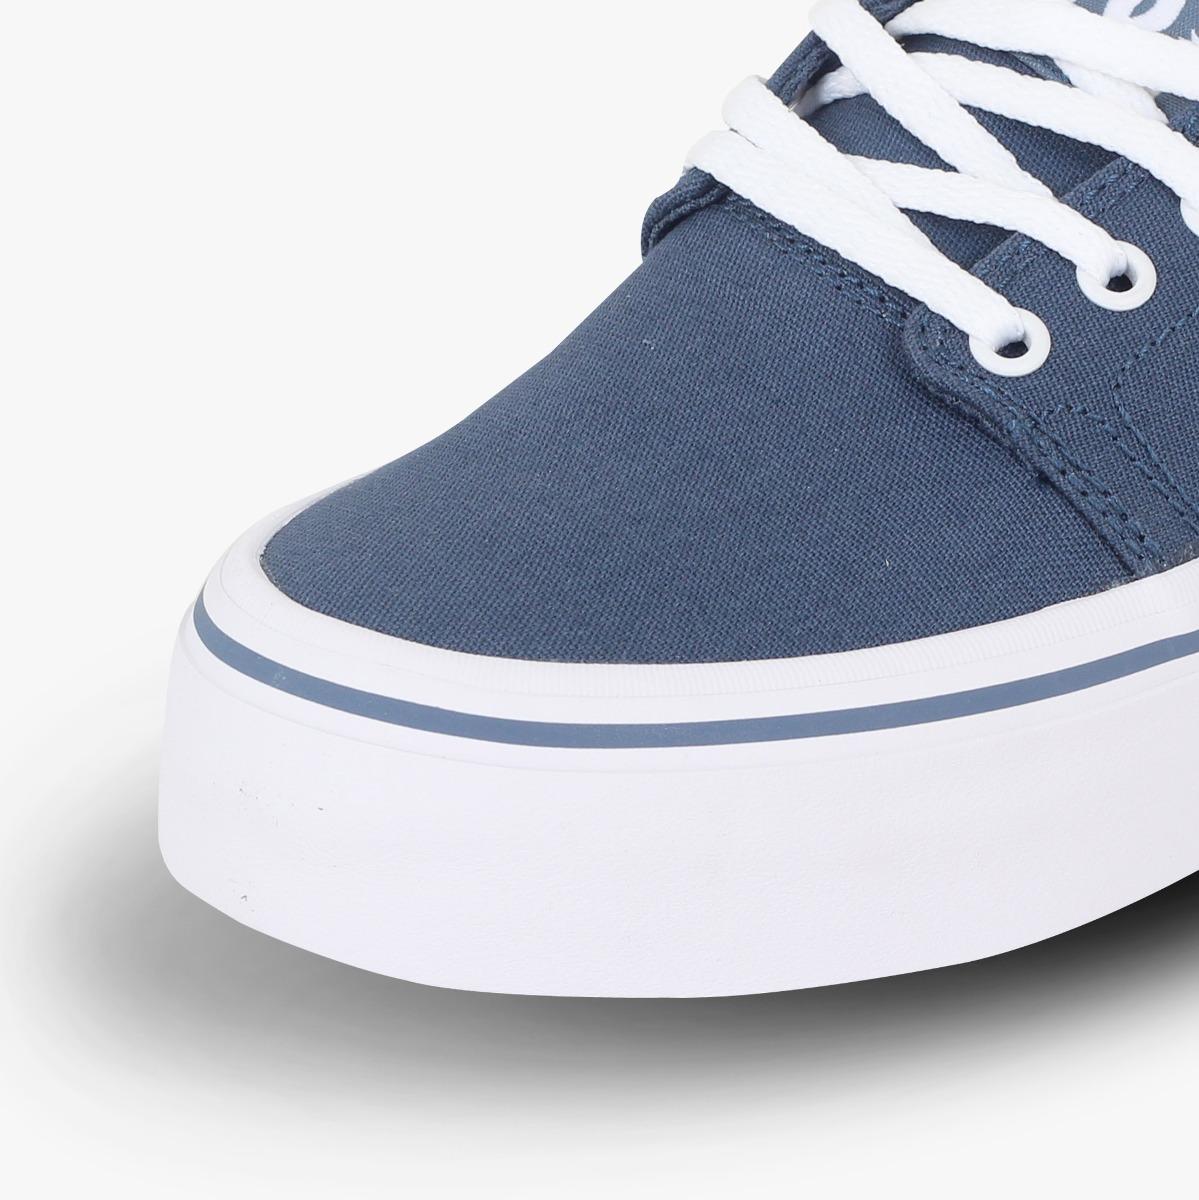 50525dcf99877 zapato dc shoes casual trase platform tx mujer- azul  blanco. Cargando zoom.